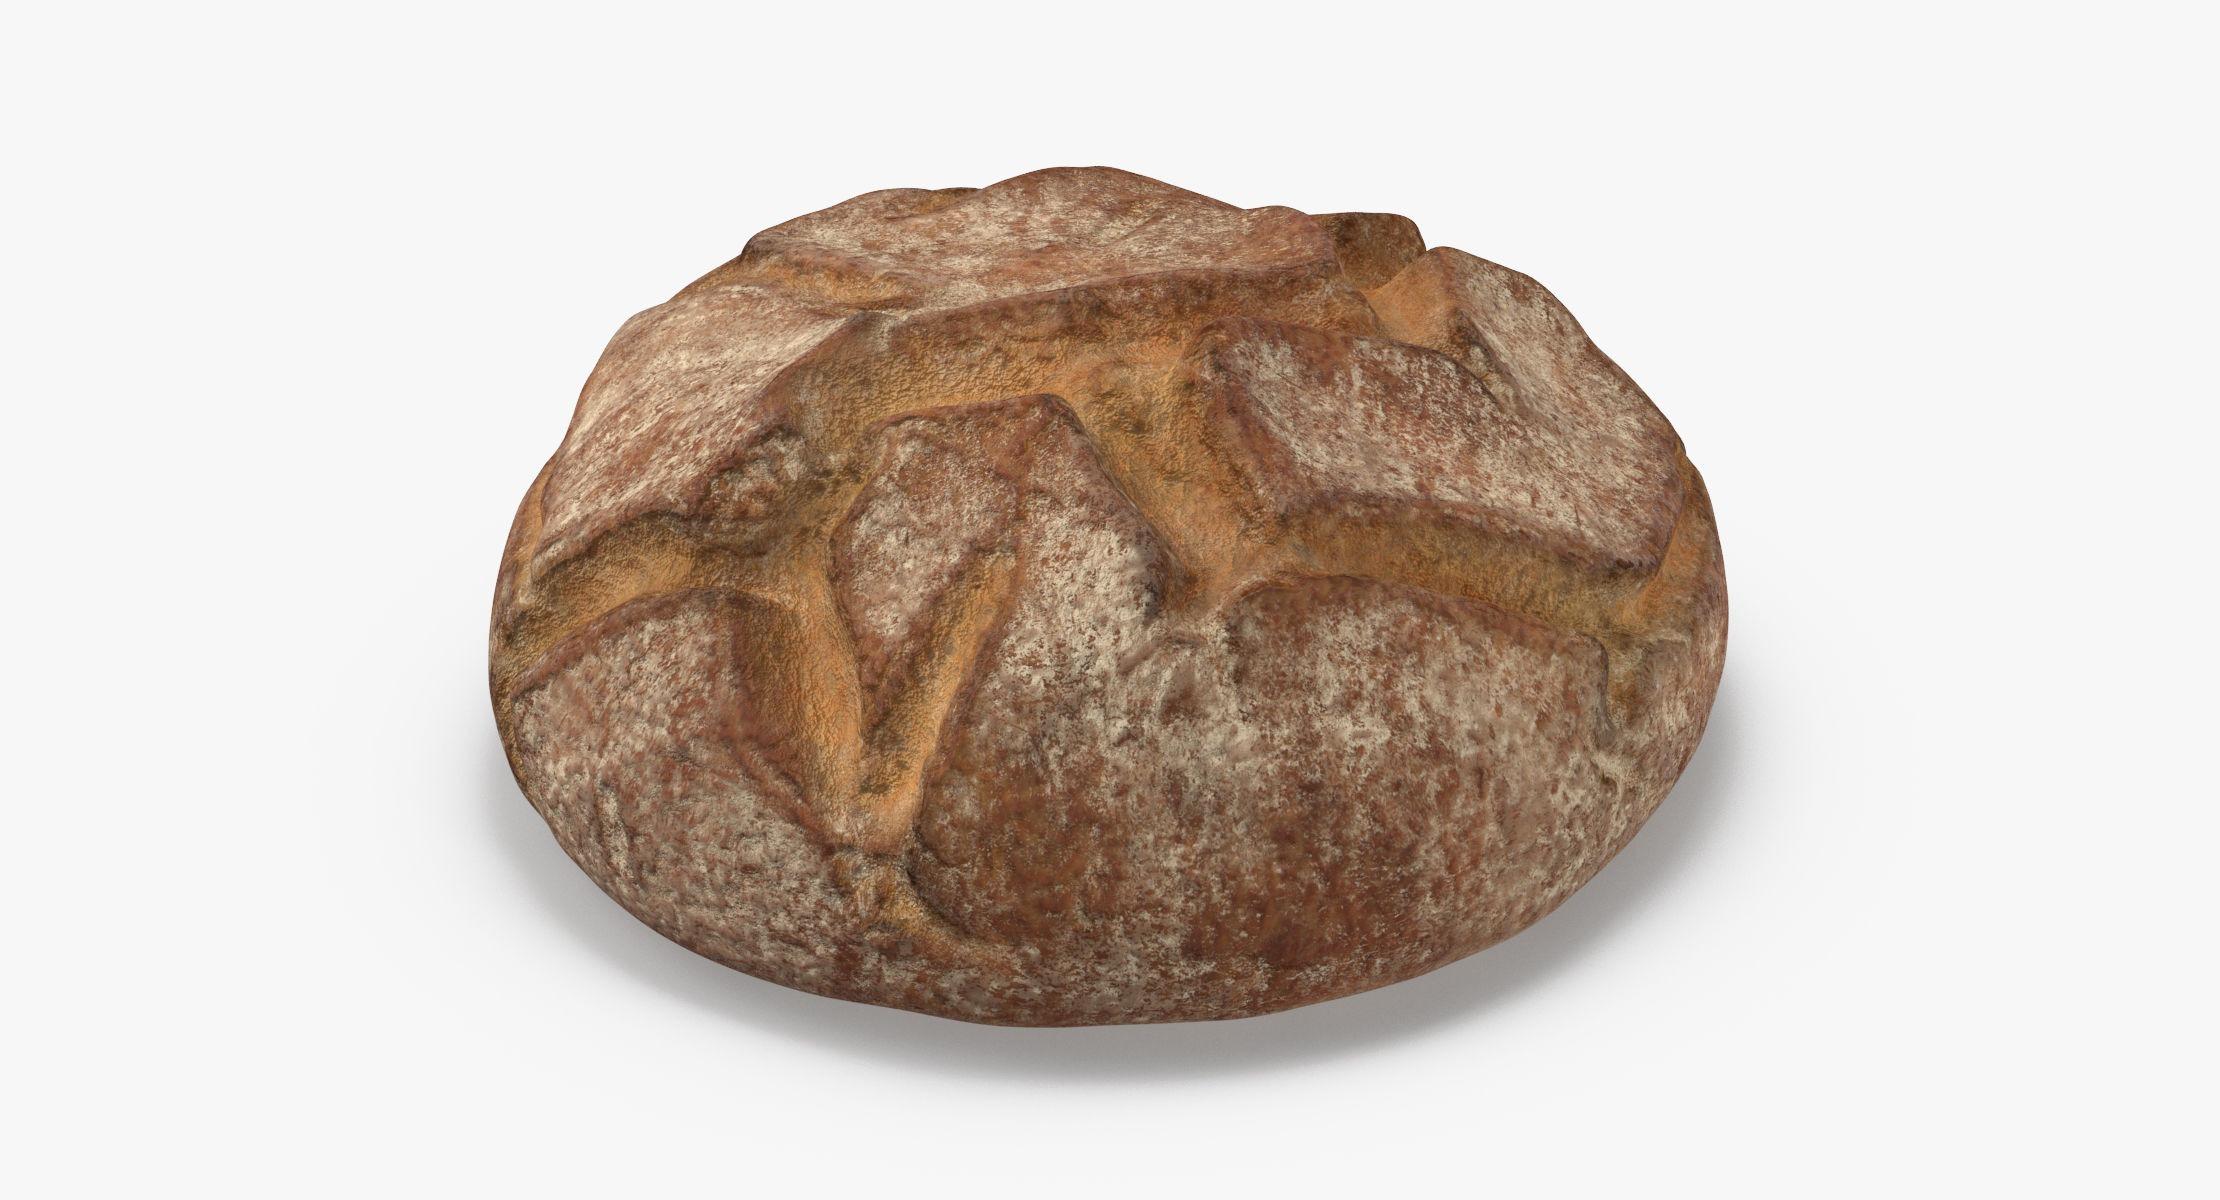 Bread Loaf 01 - reel 1